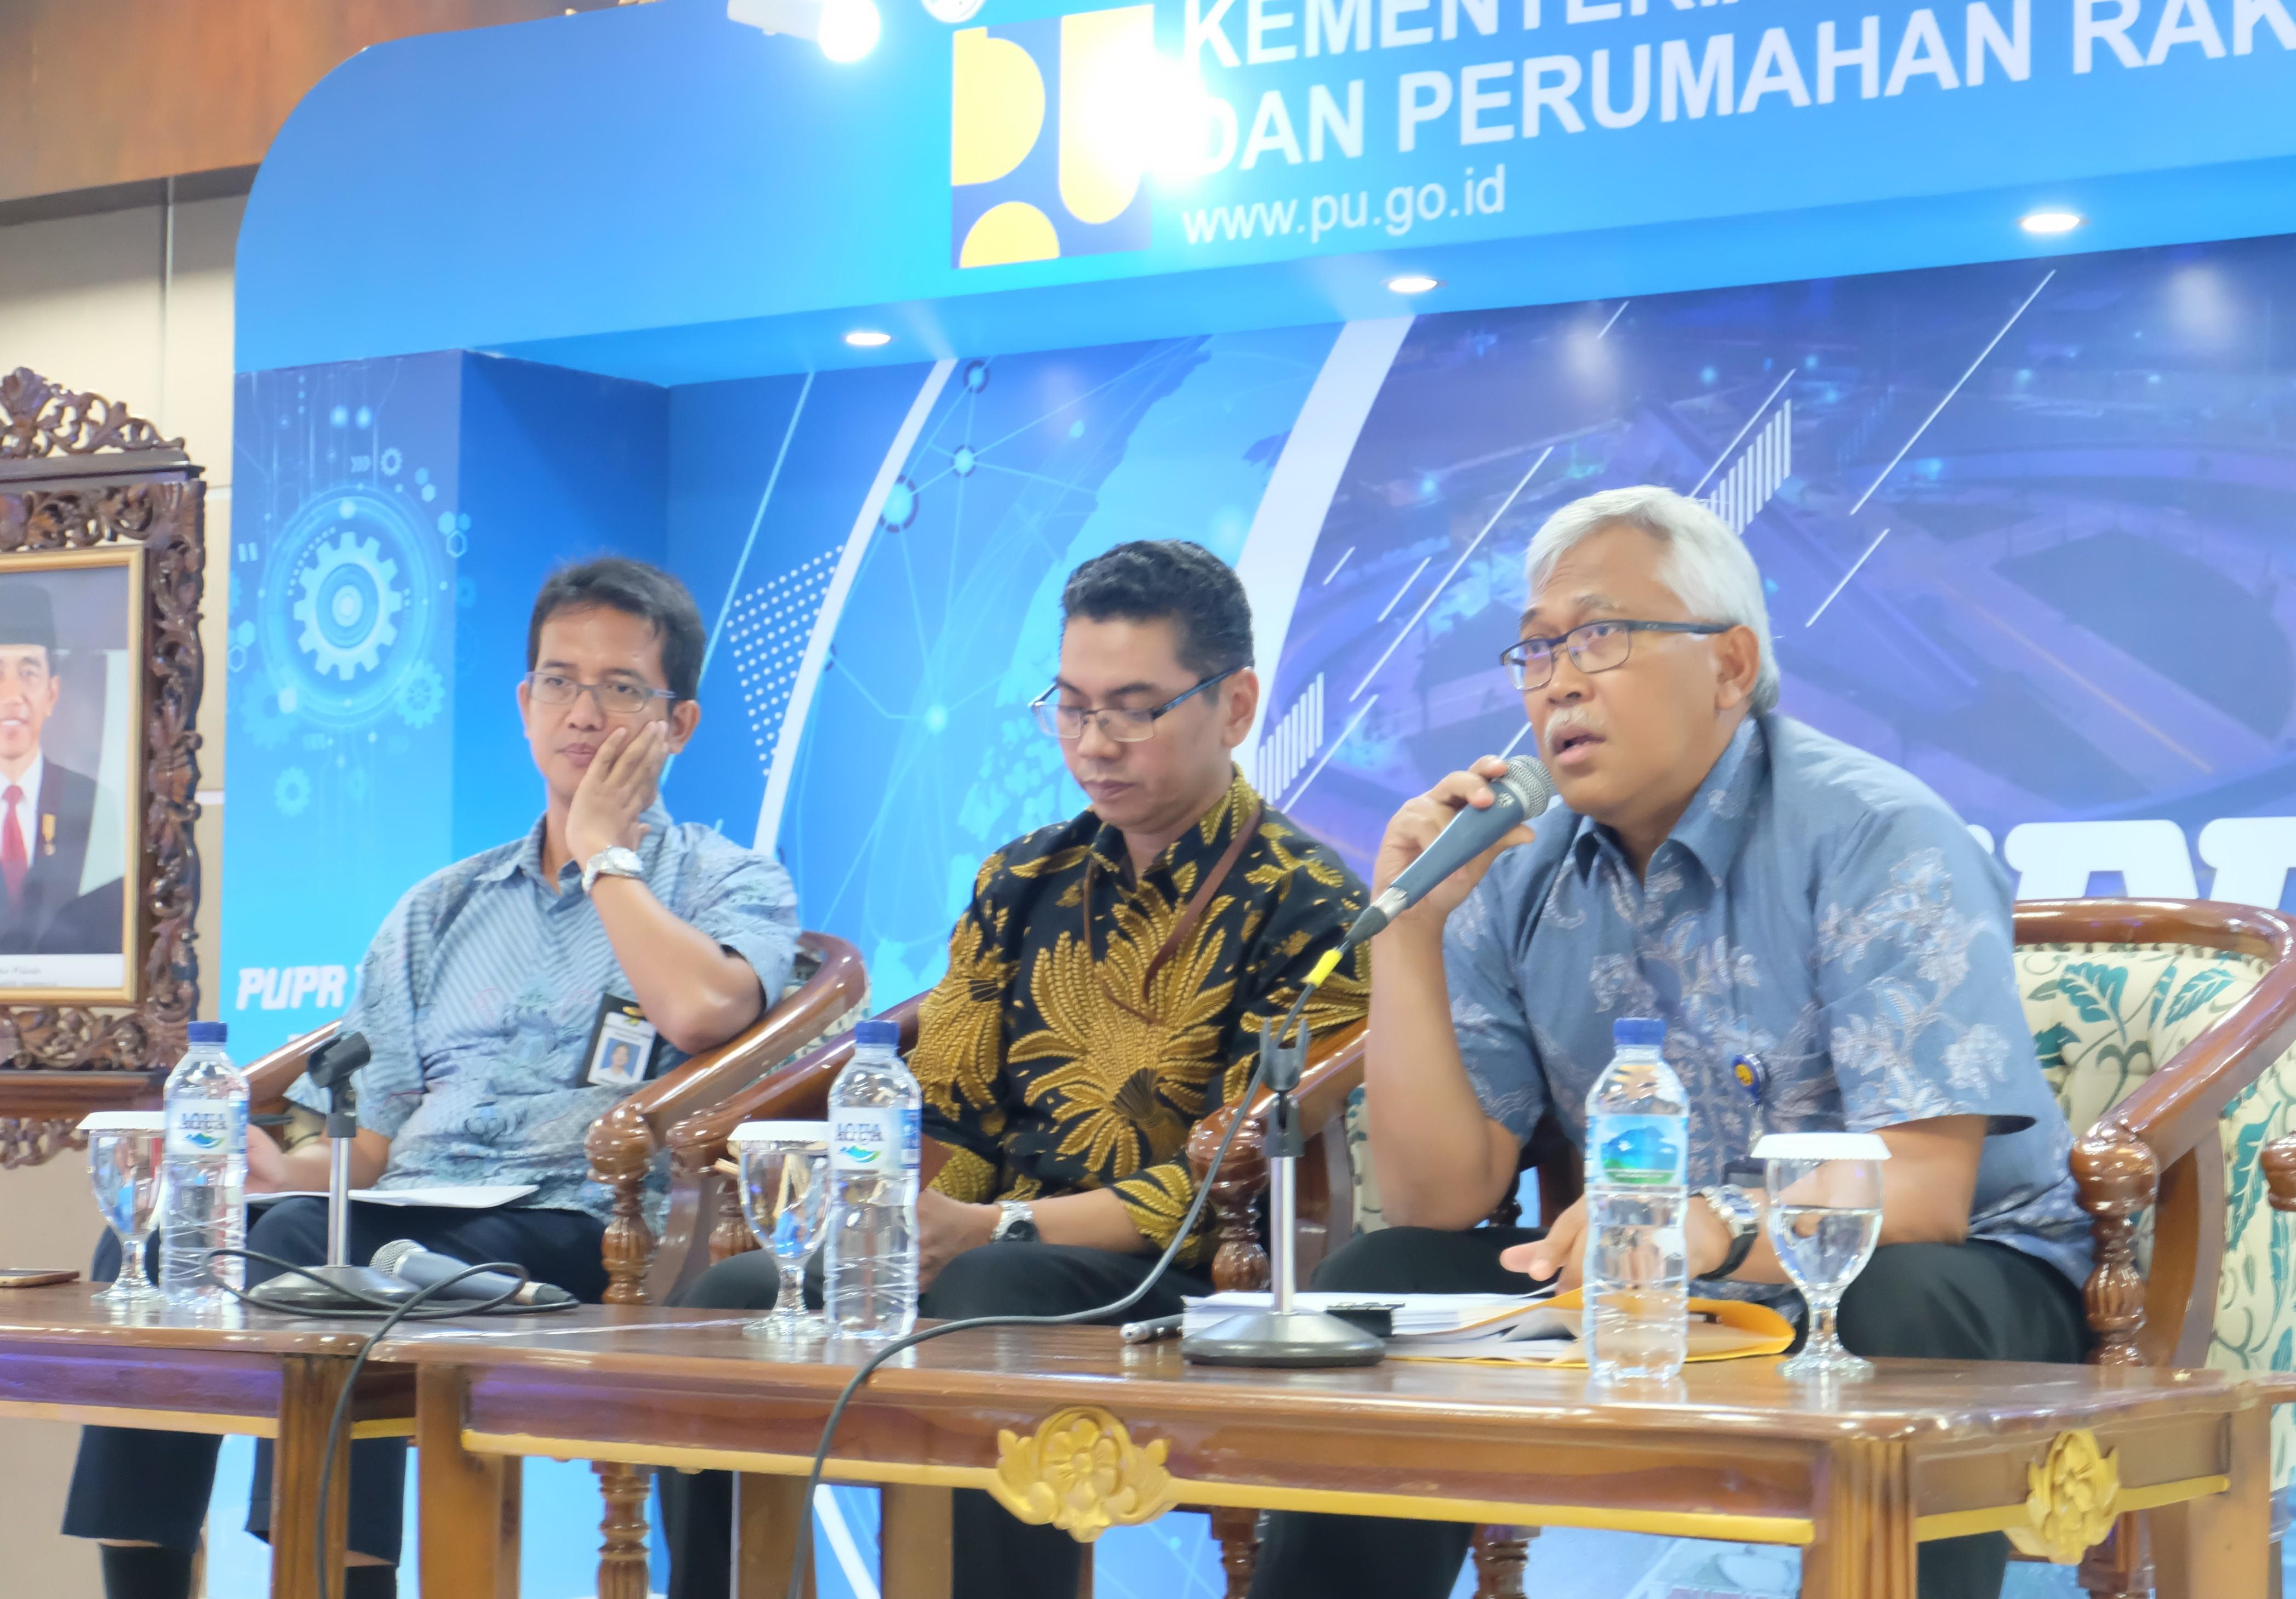 Pengembangan Infrastruktur PUPR Lebih Fokus Dukung Empat KSPN